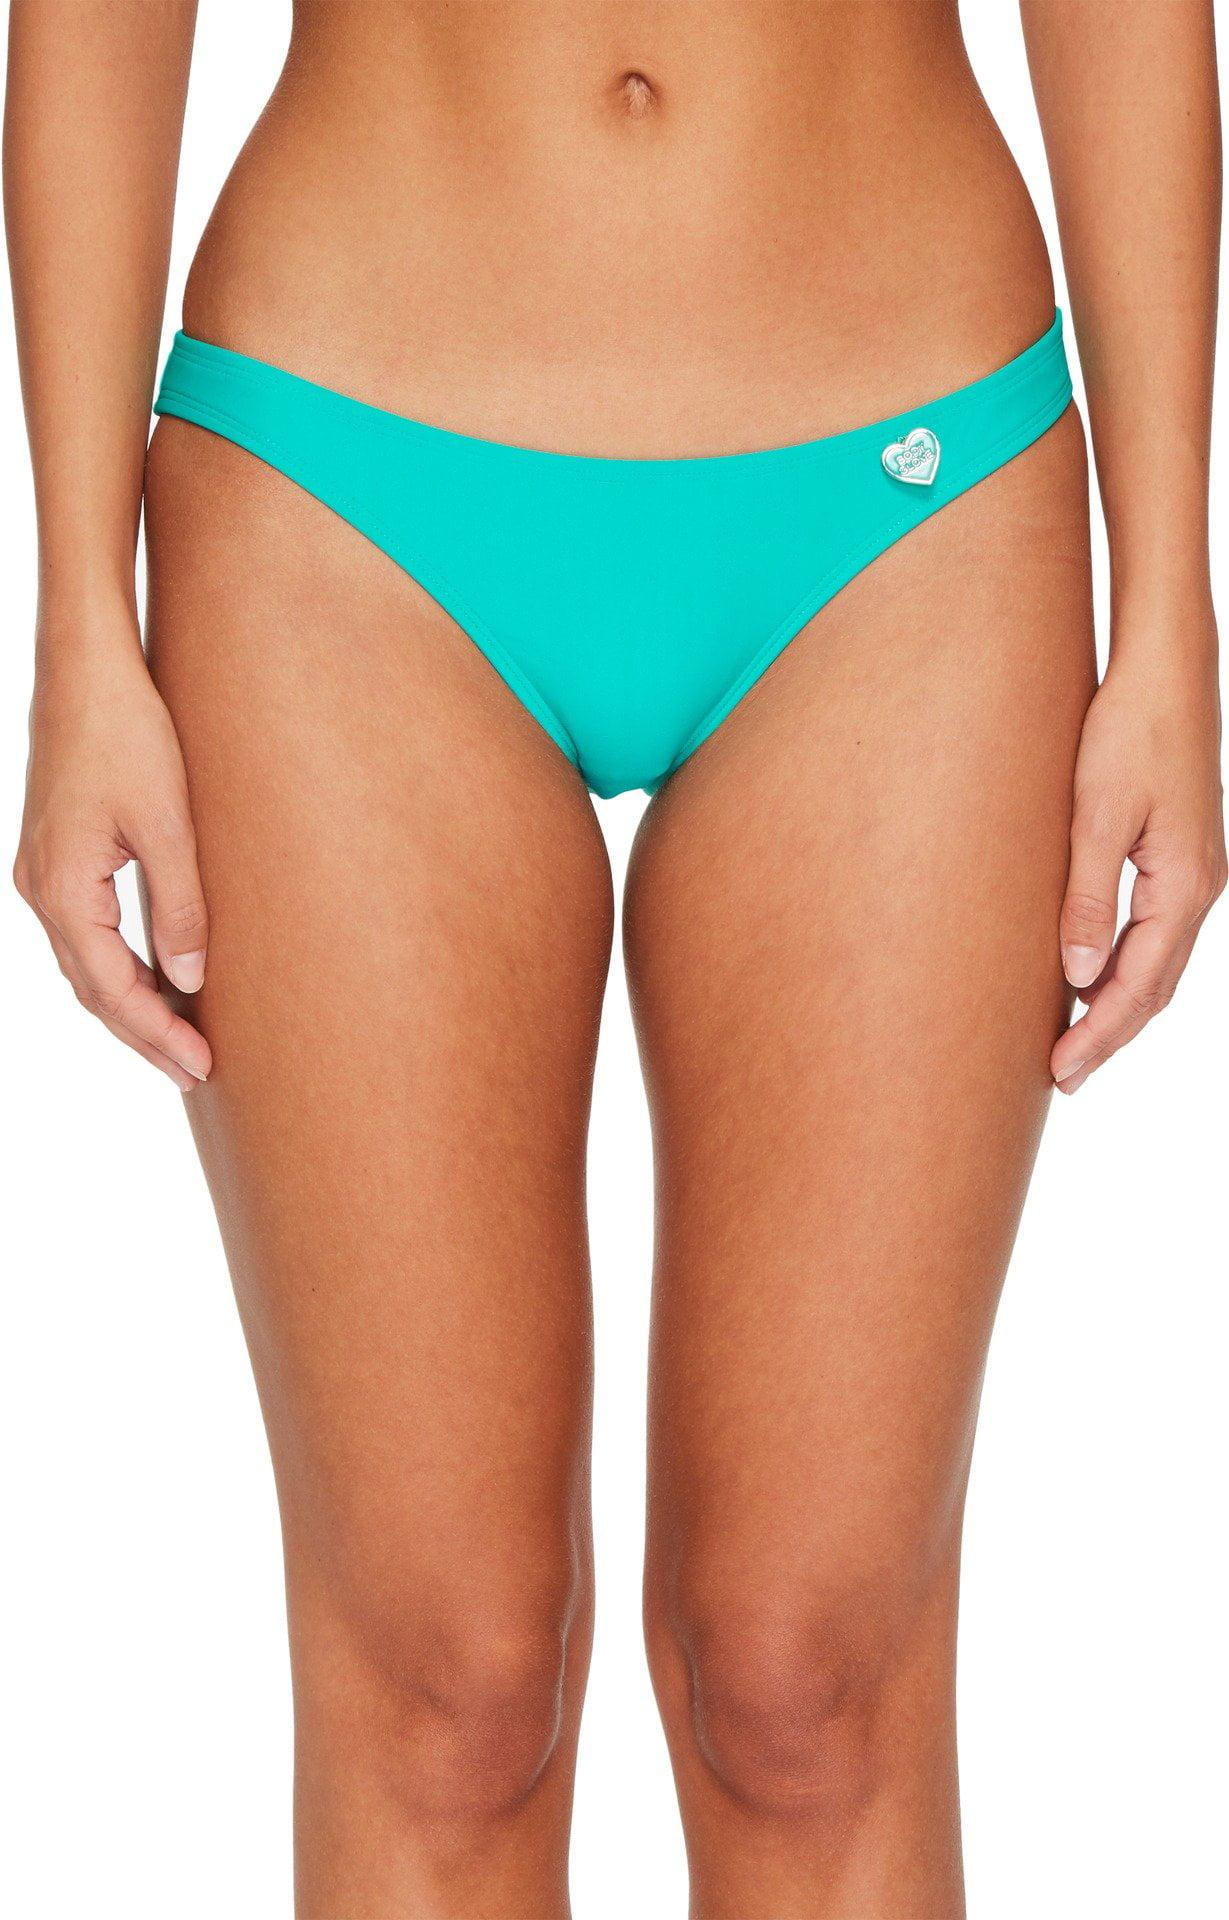 glove Bikini beach body